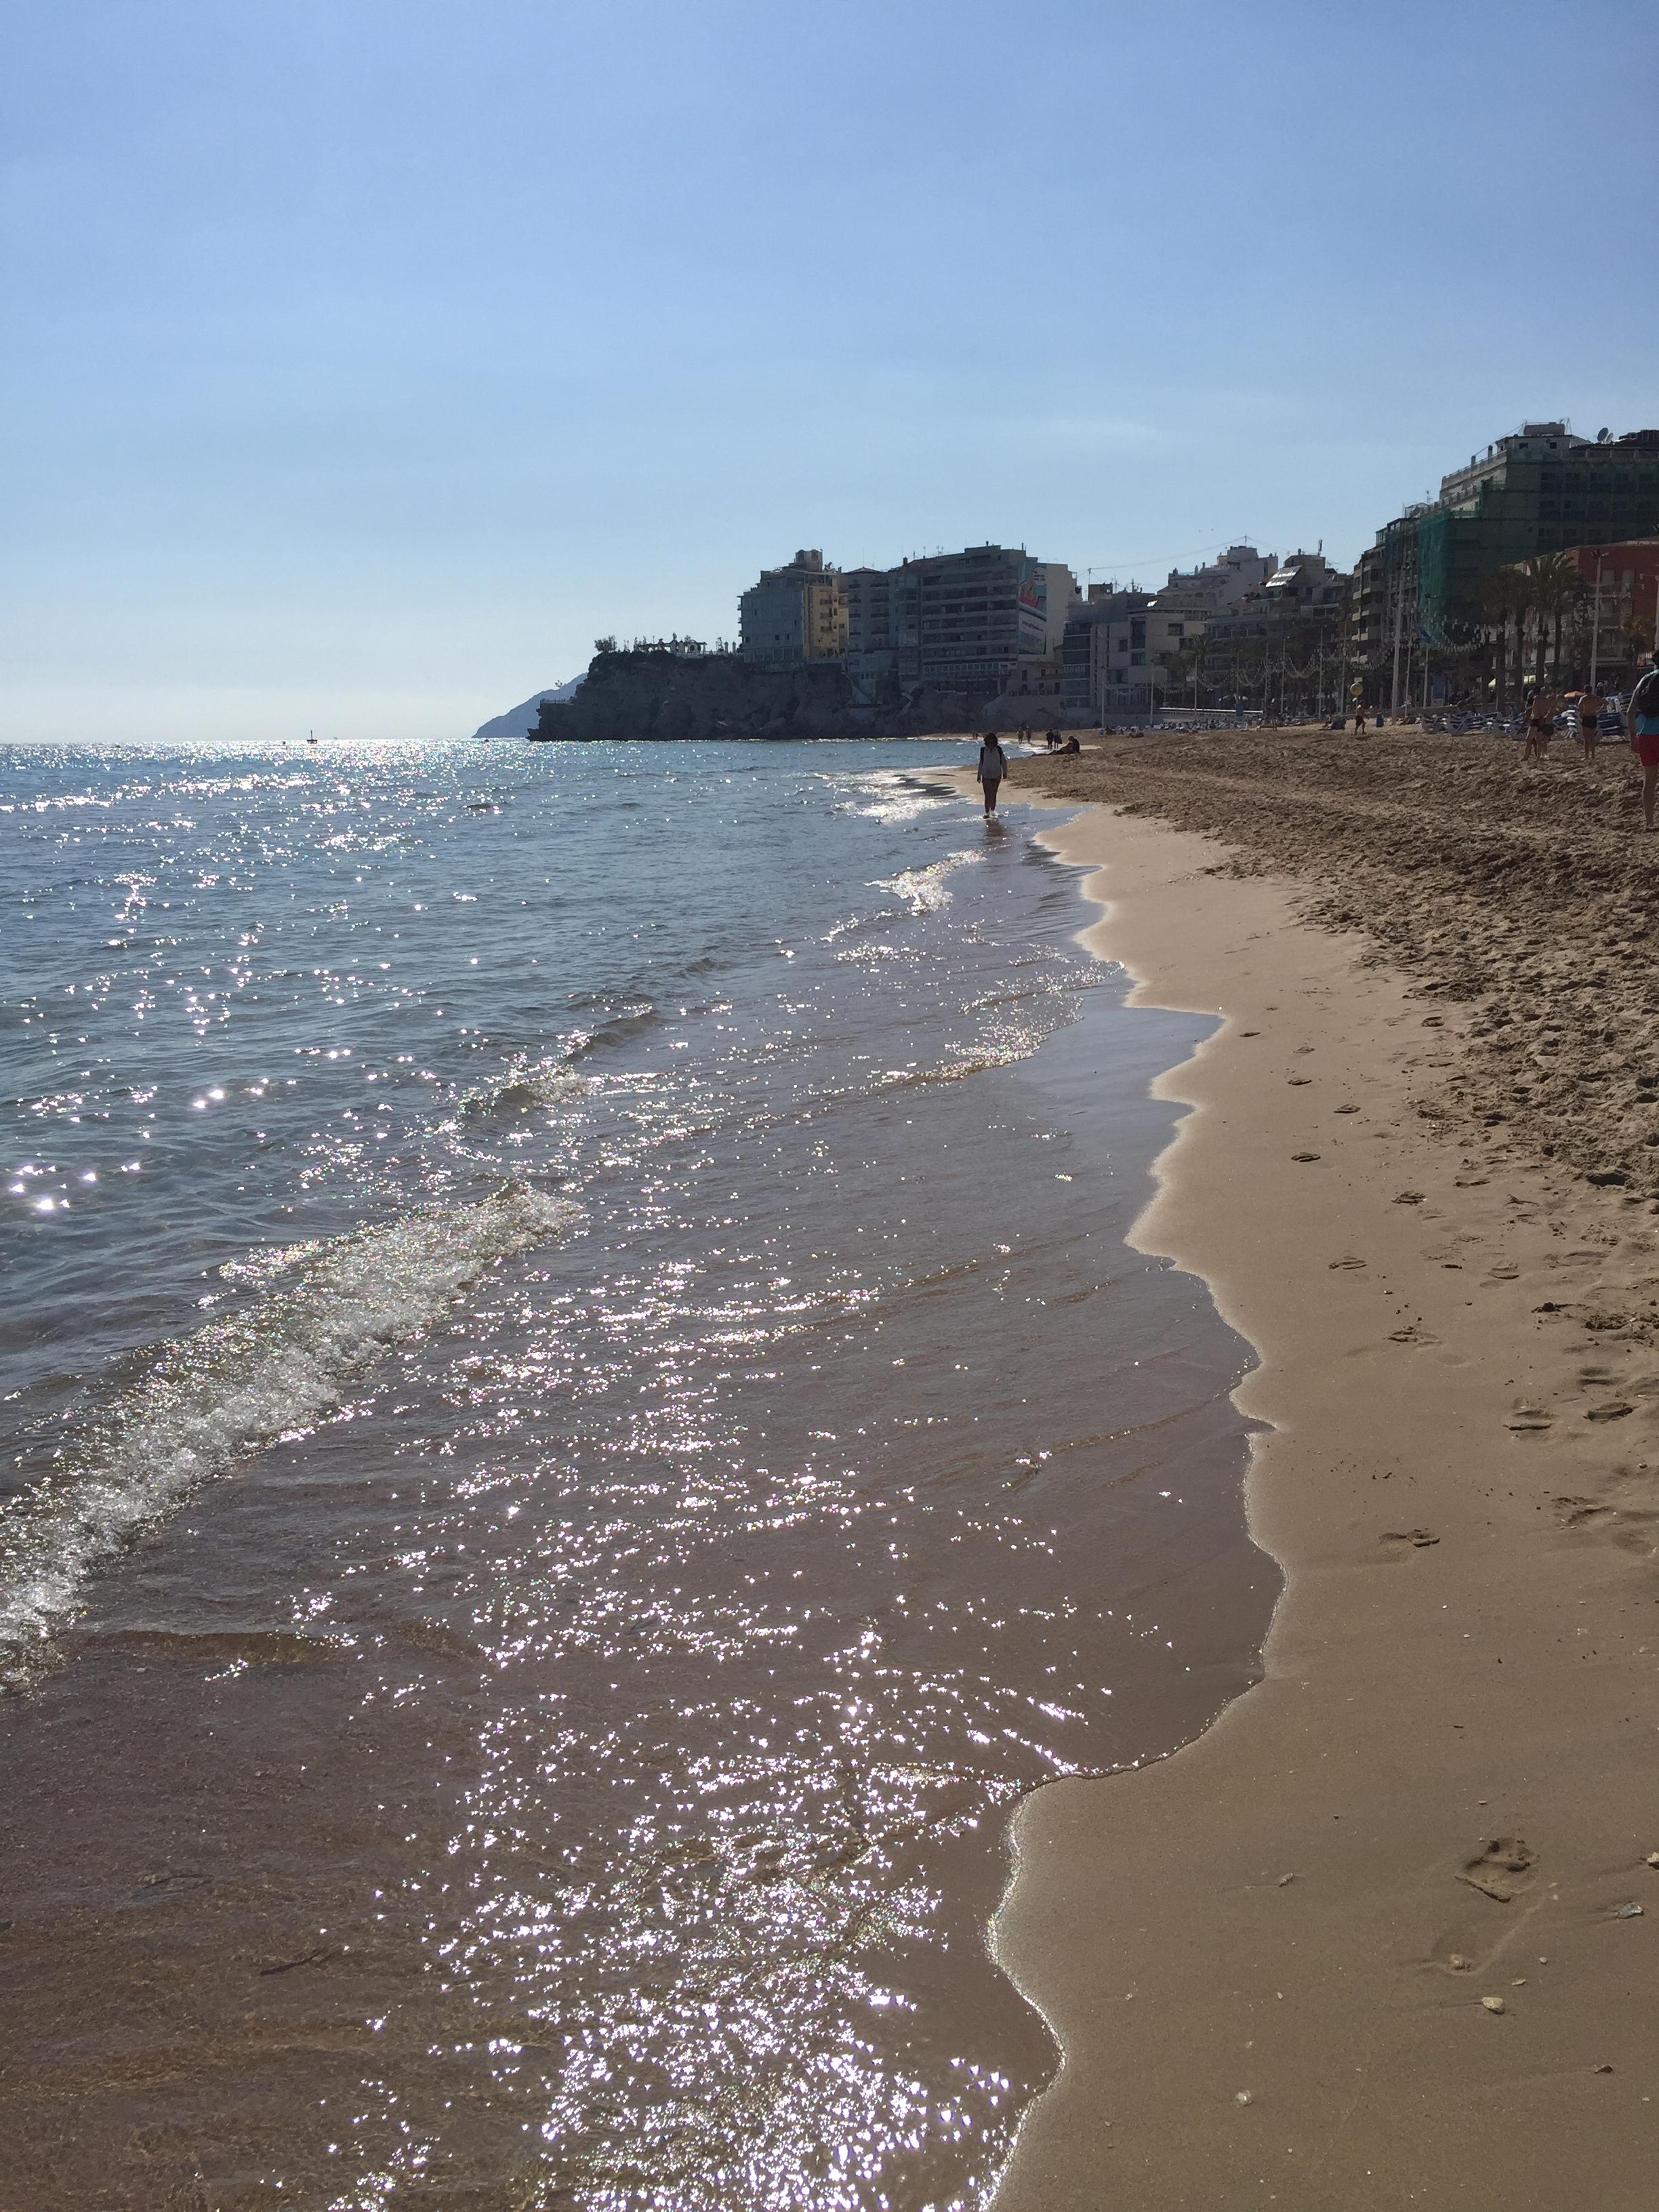 The beach at Benidorm, not far from Alicante